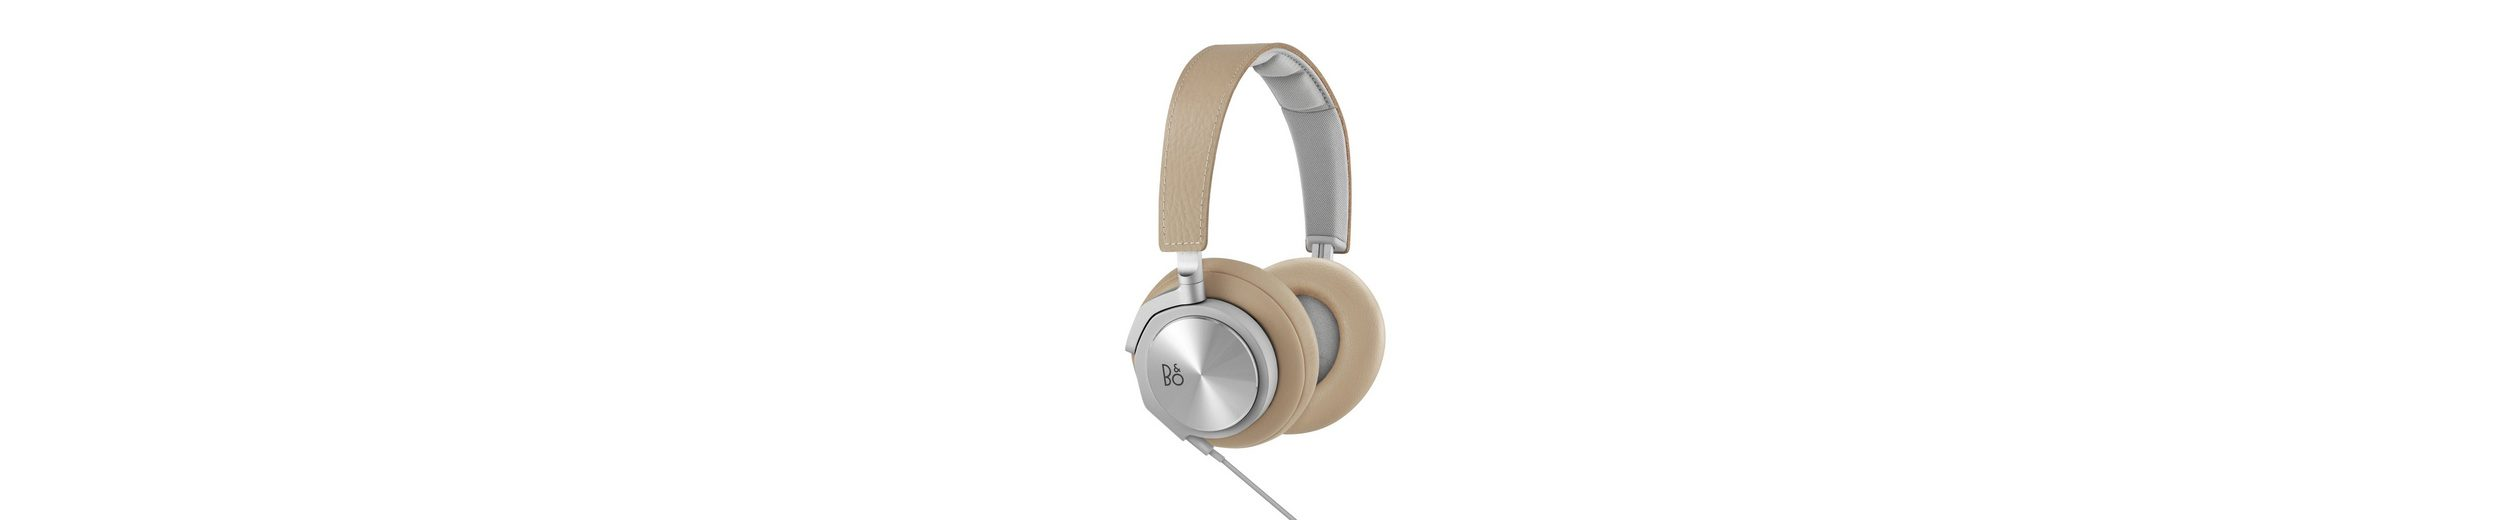 B&O-Play Over-Ear Kopfhörer »BeoPlay H6 2nd. Generation«